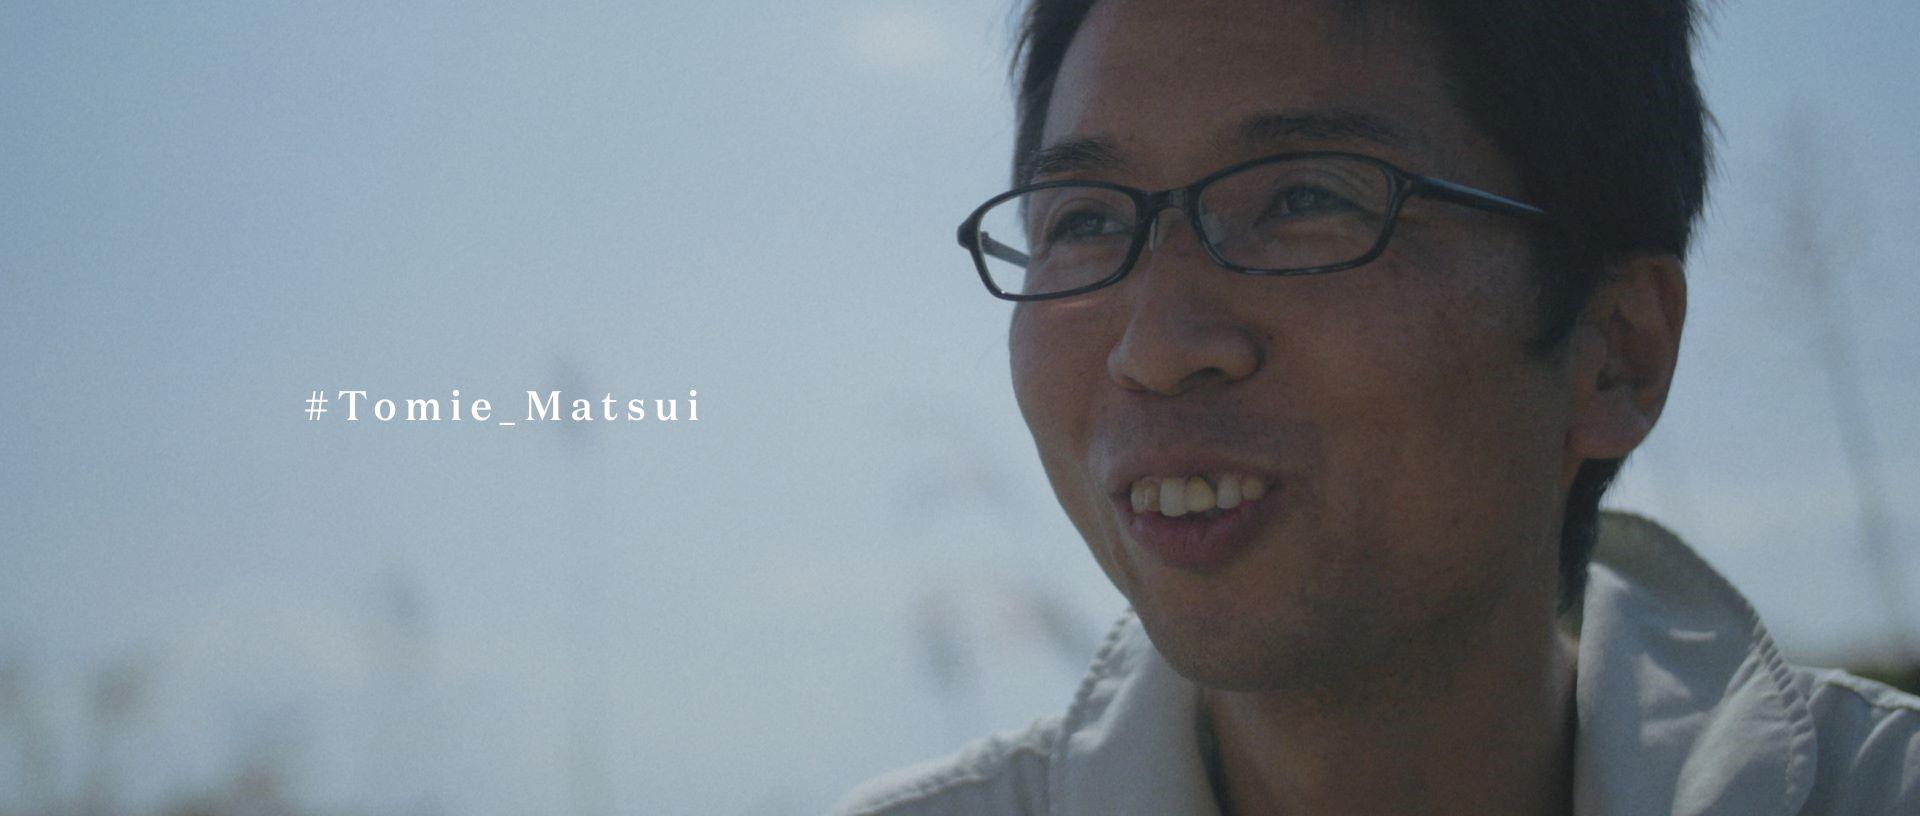 #Tomie_Matsui とタグが出てくる